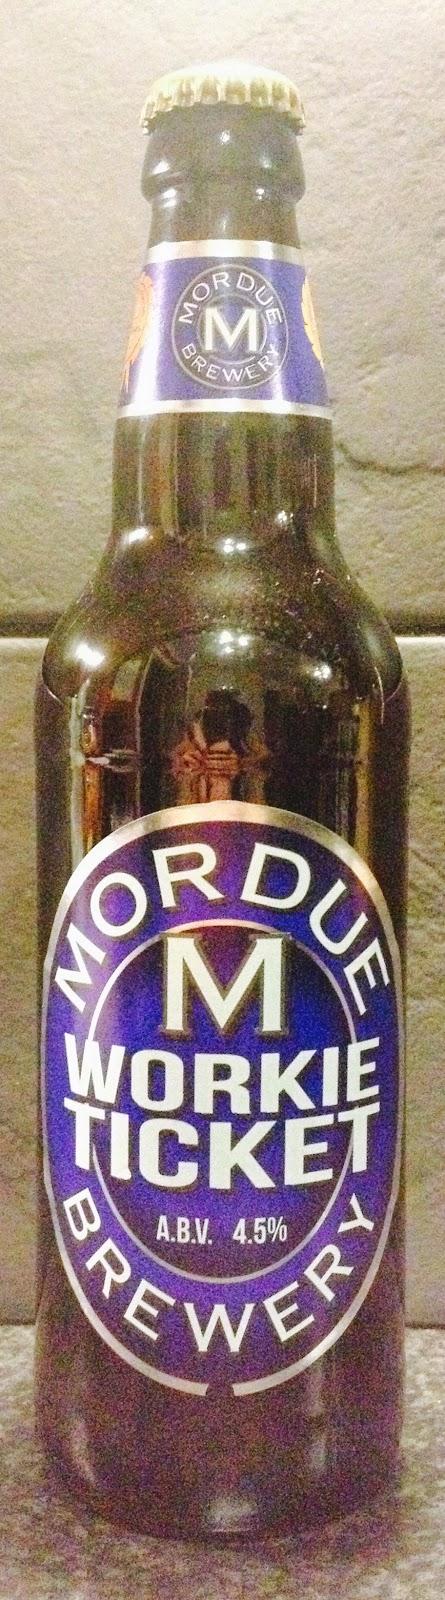 Workie Ticket (Mordue)